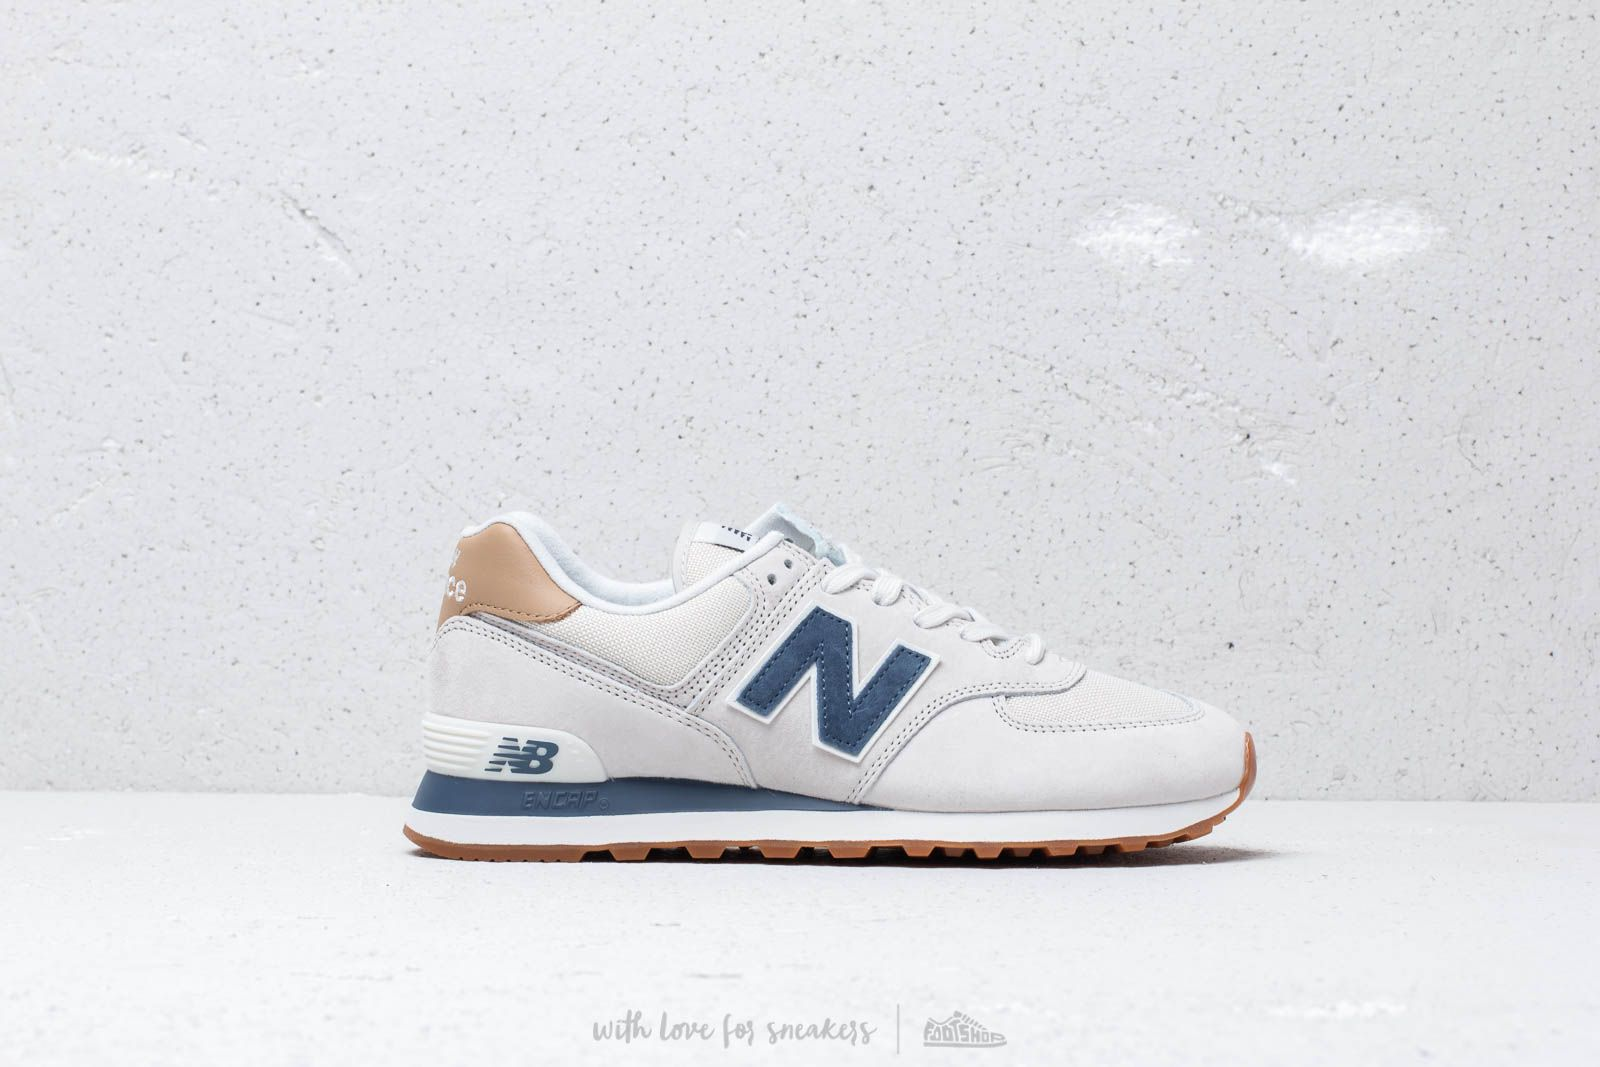 574 Blue New Balance Grey WhiteFootshop BrdxoeC